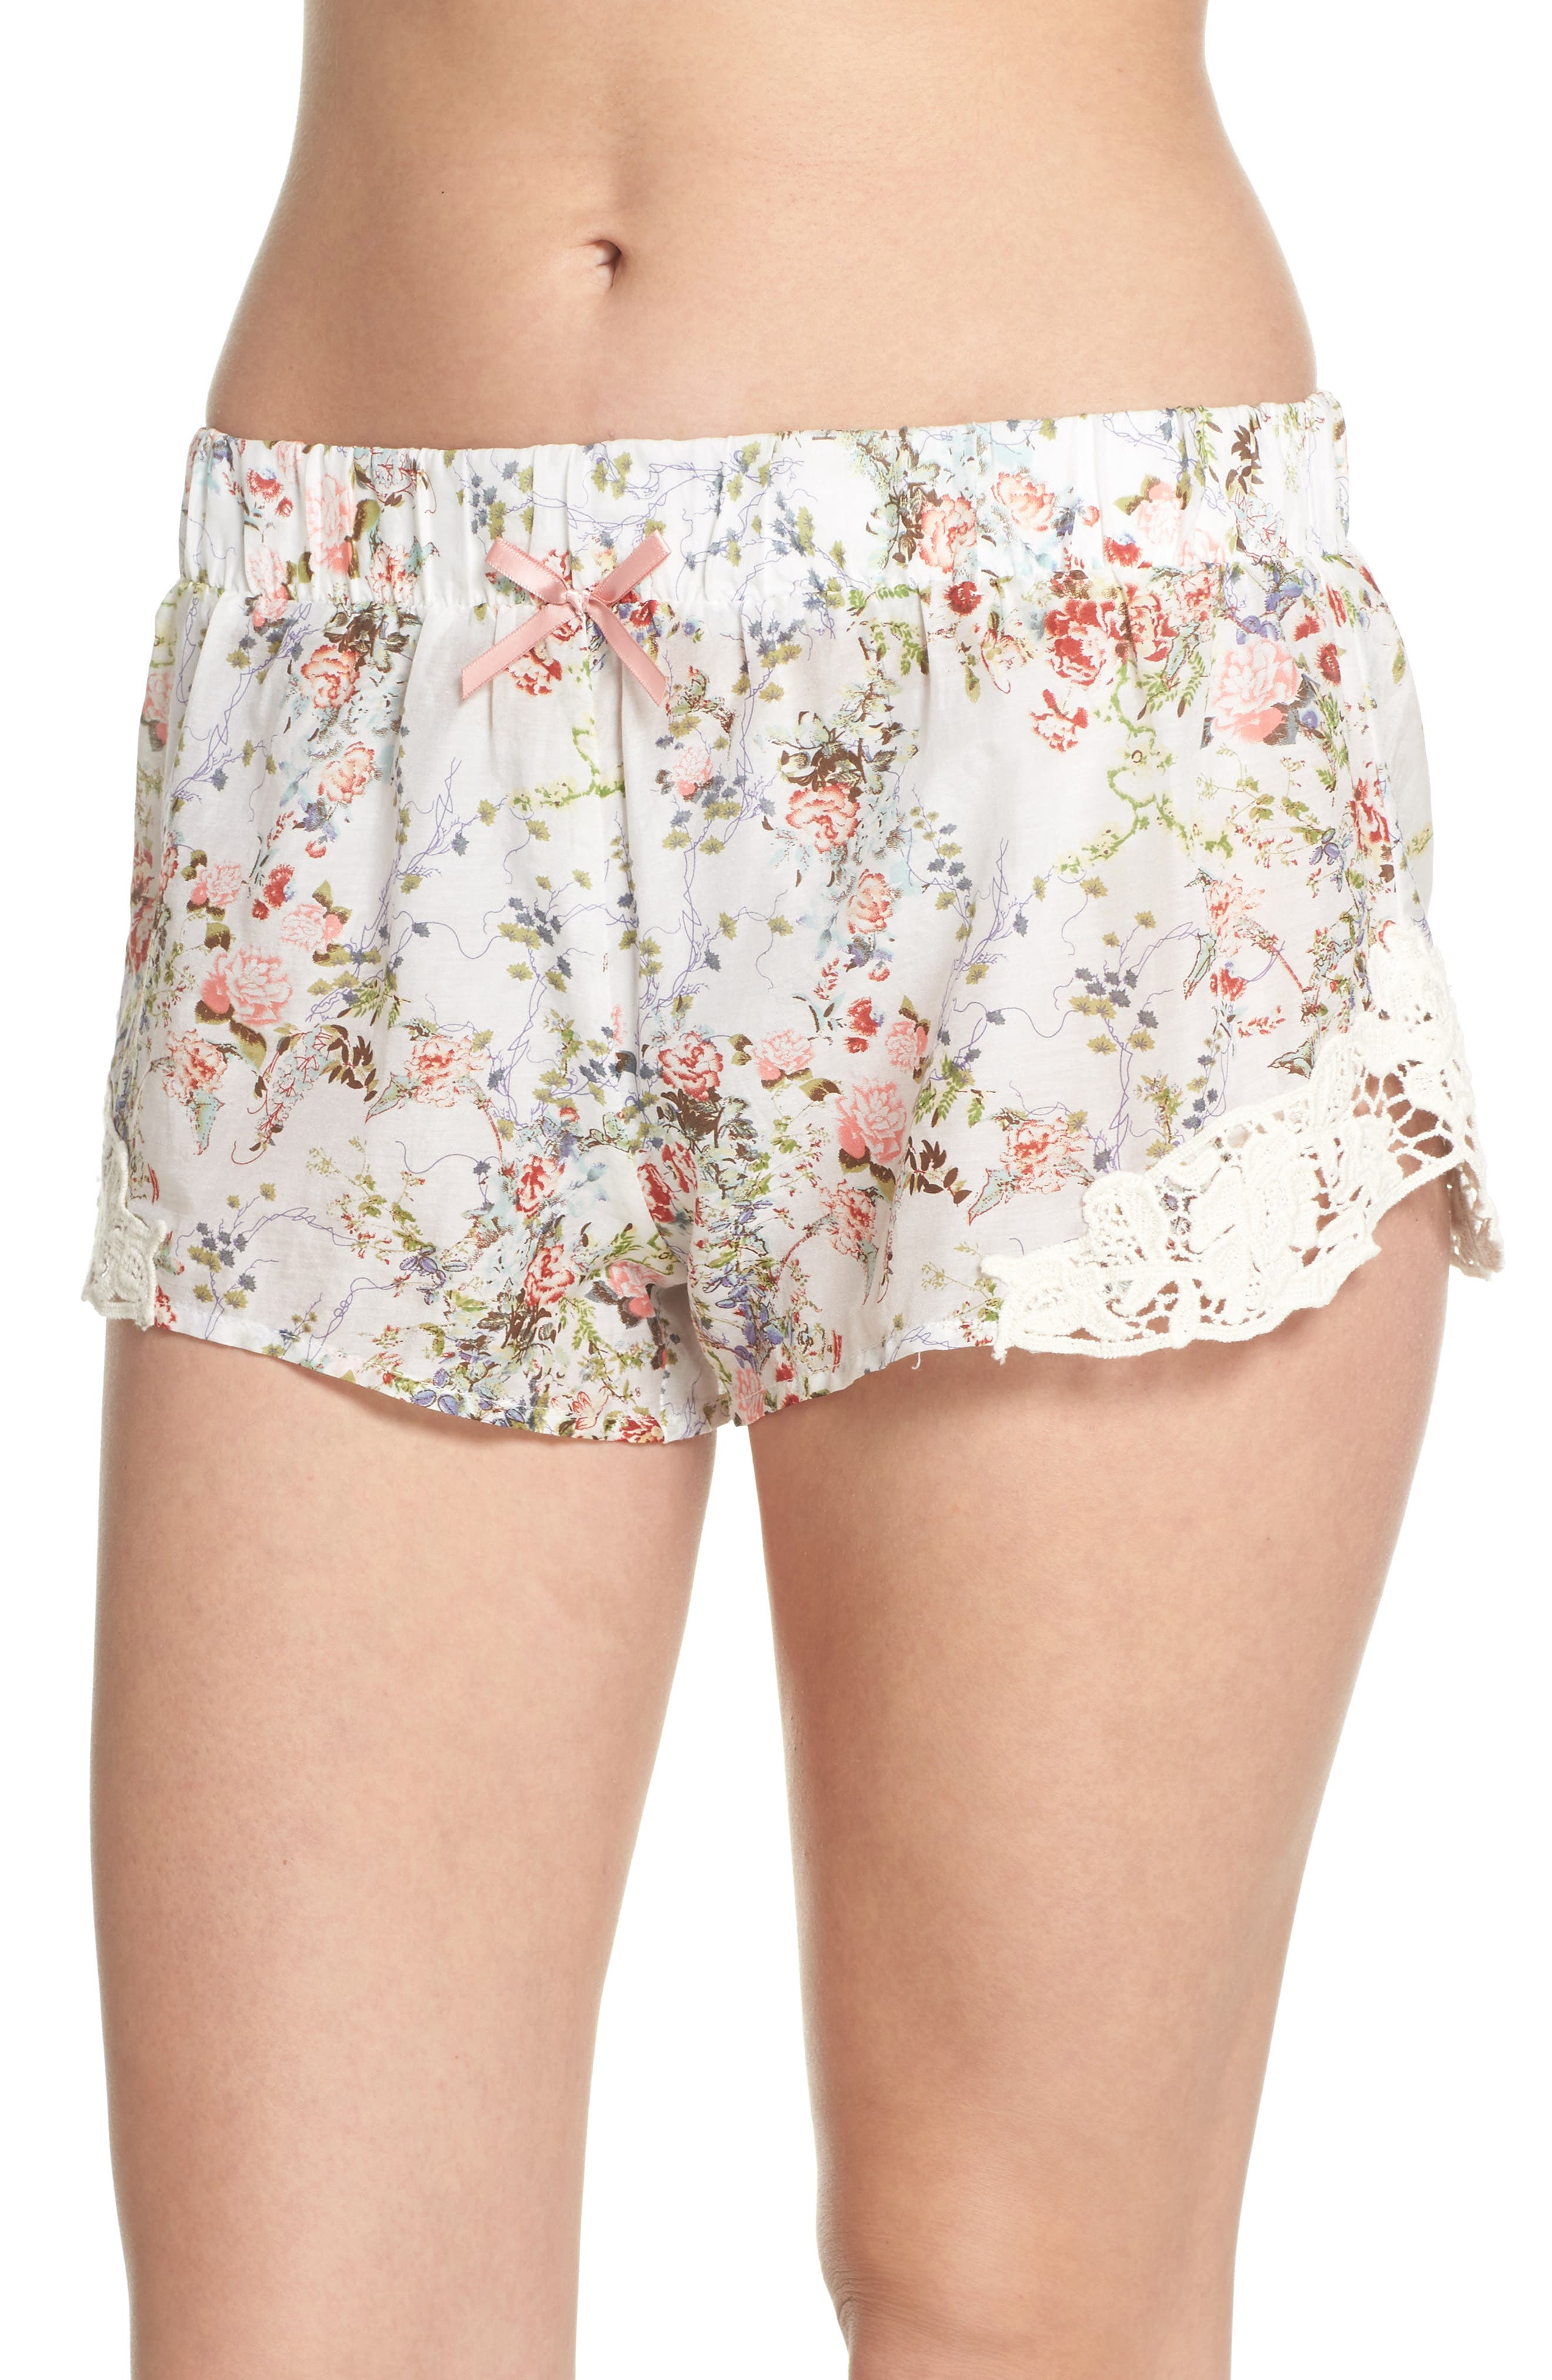 Yolly Floral Pajama Shorts,                         Main,                         color, IVORY FLORAL